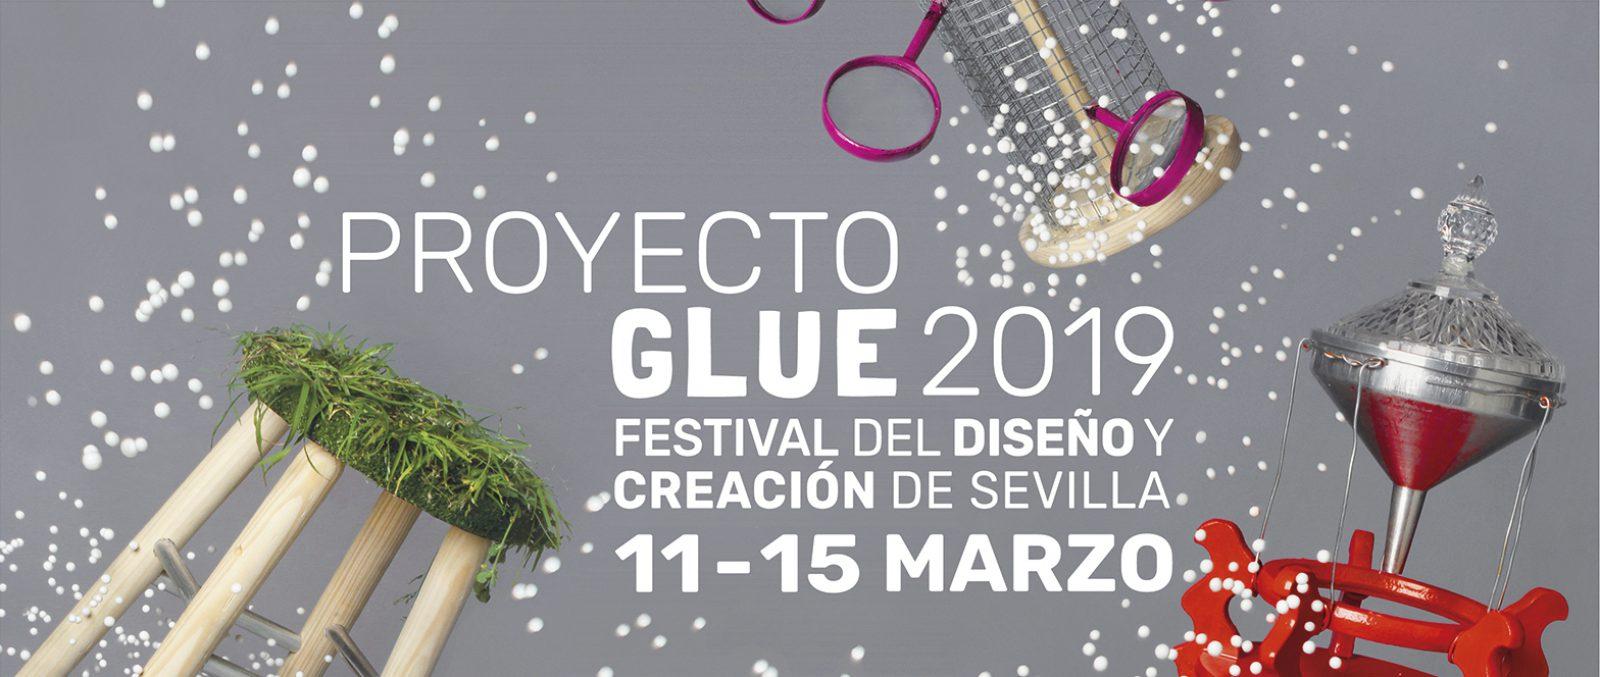 Proyecto Glue